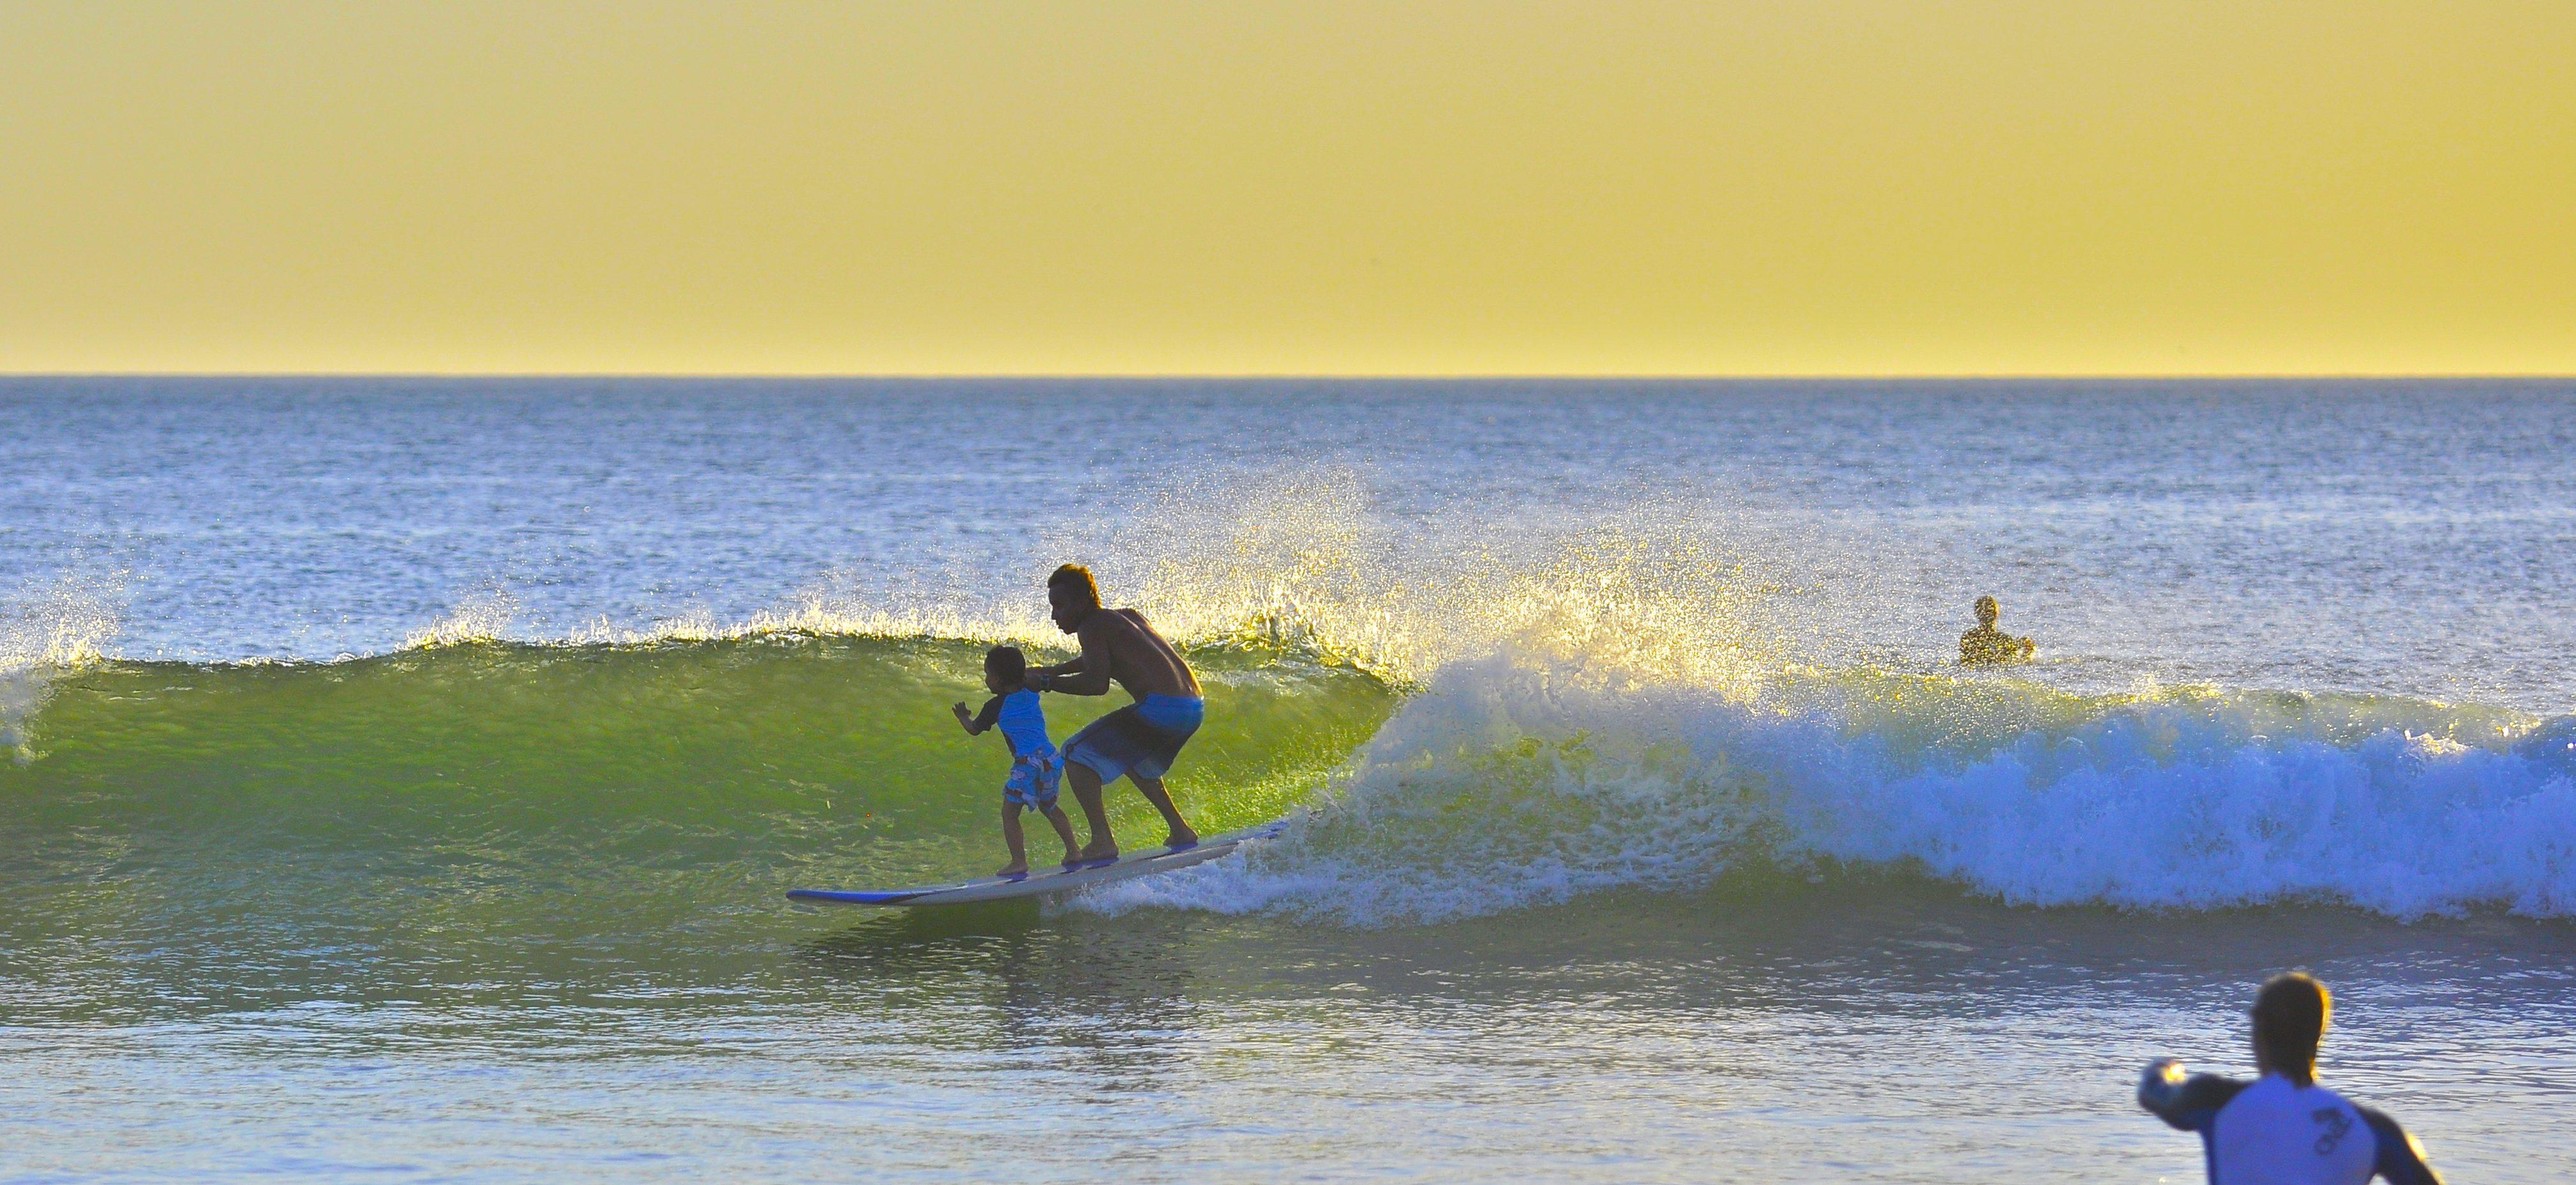 Resultado de imagem para Playa Grande costa rica